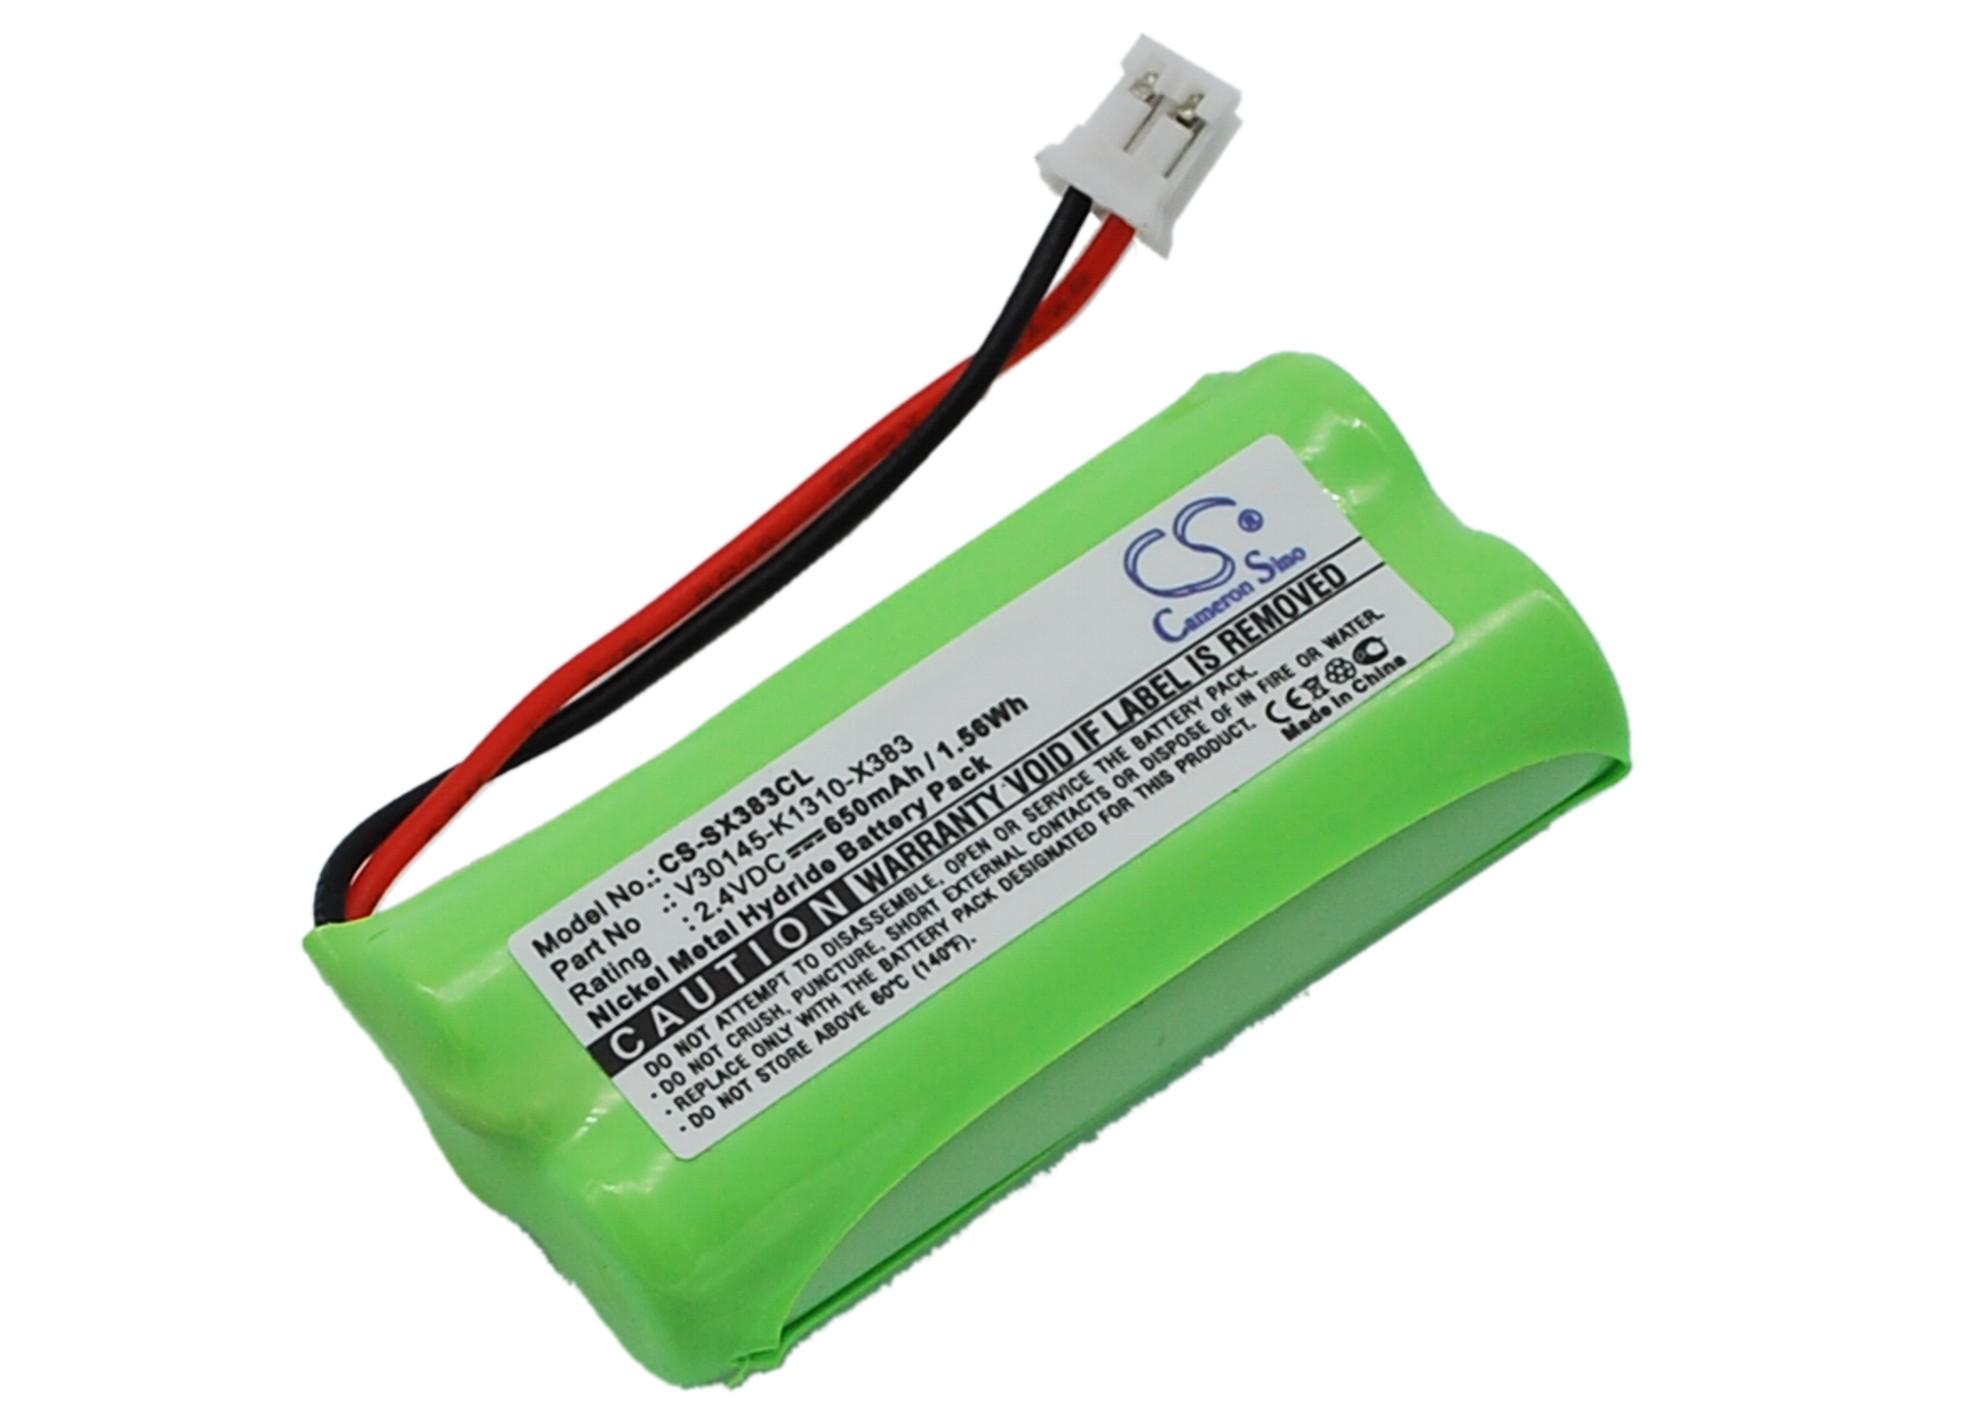 Cameron Sino baterie do bezdrátových telefonů za V30145-K1310-X383 2.4V Ni-MH 650mAh černá - neoriginální